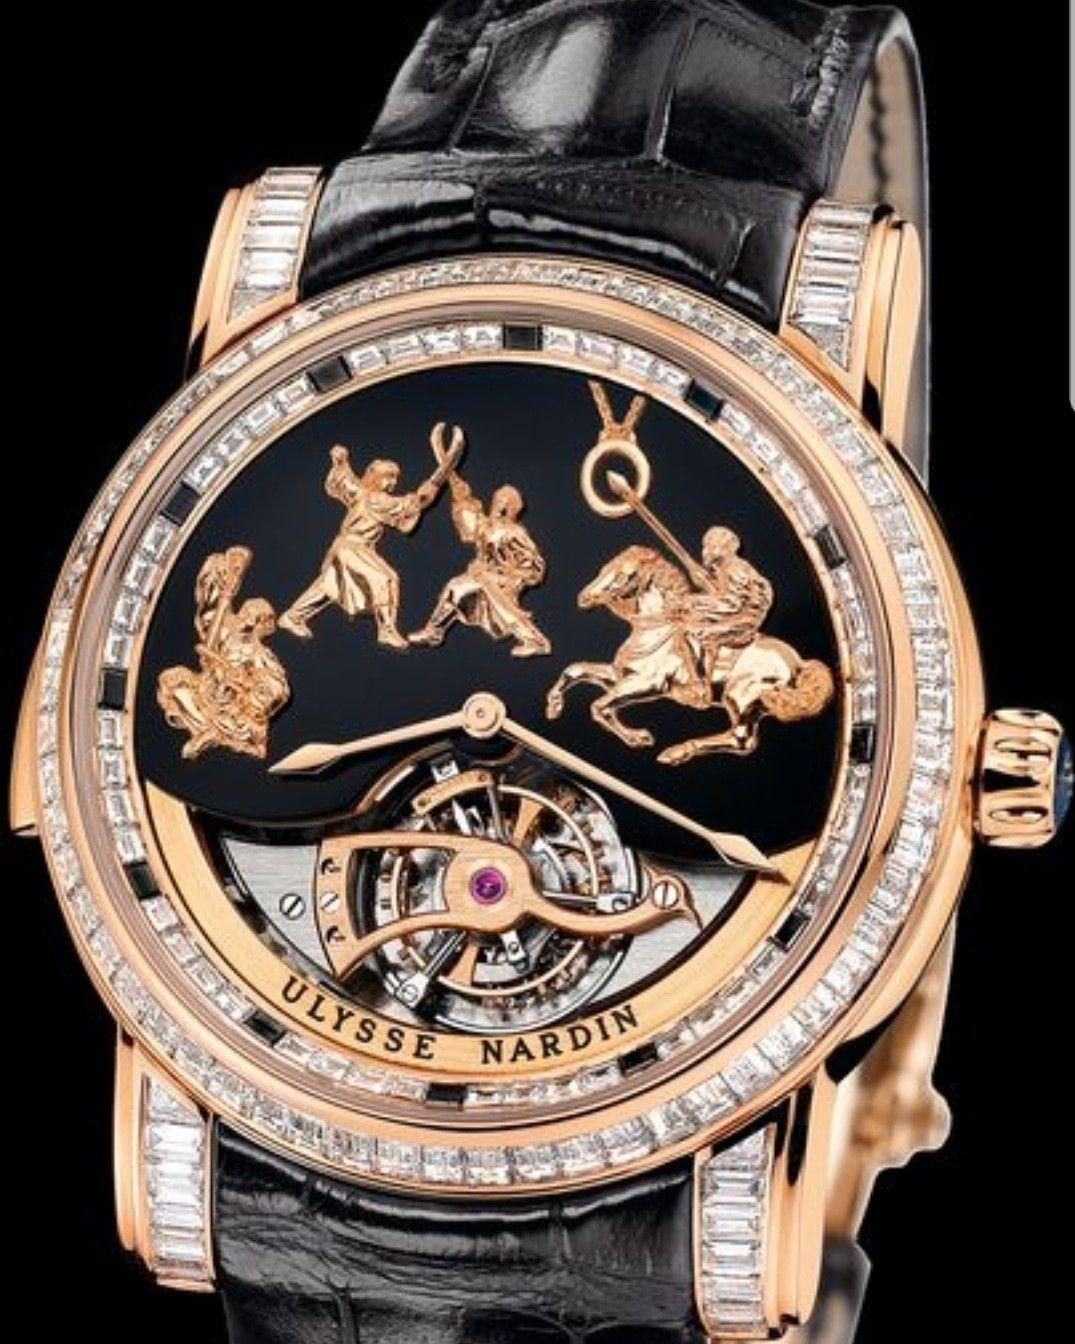 #Masterpiece #watch #orologi #jewelry #watchdesign #